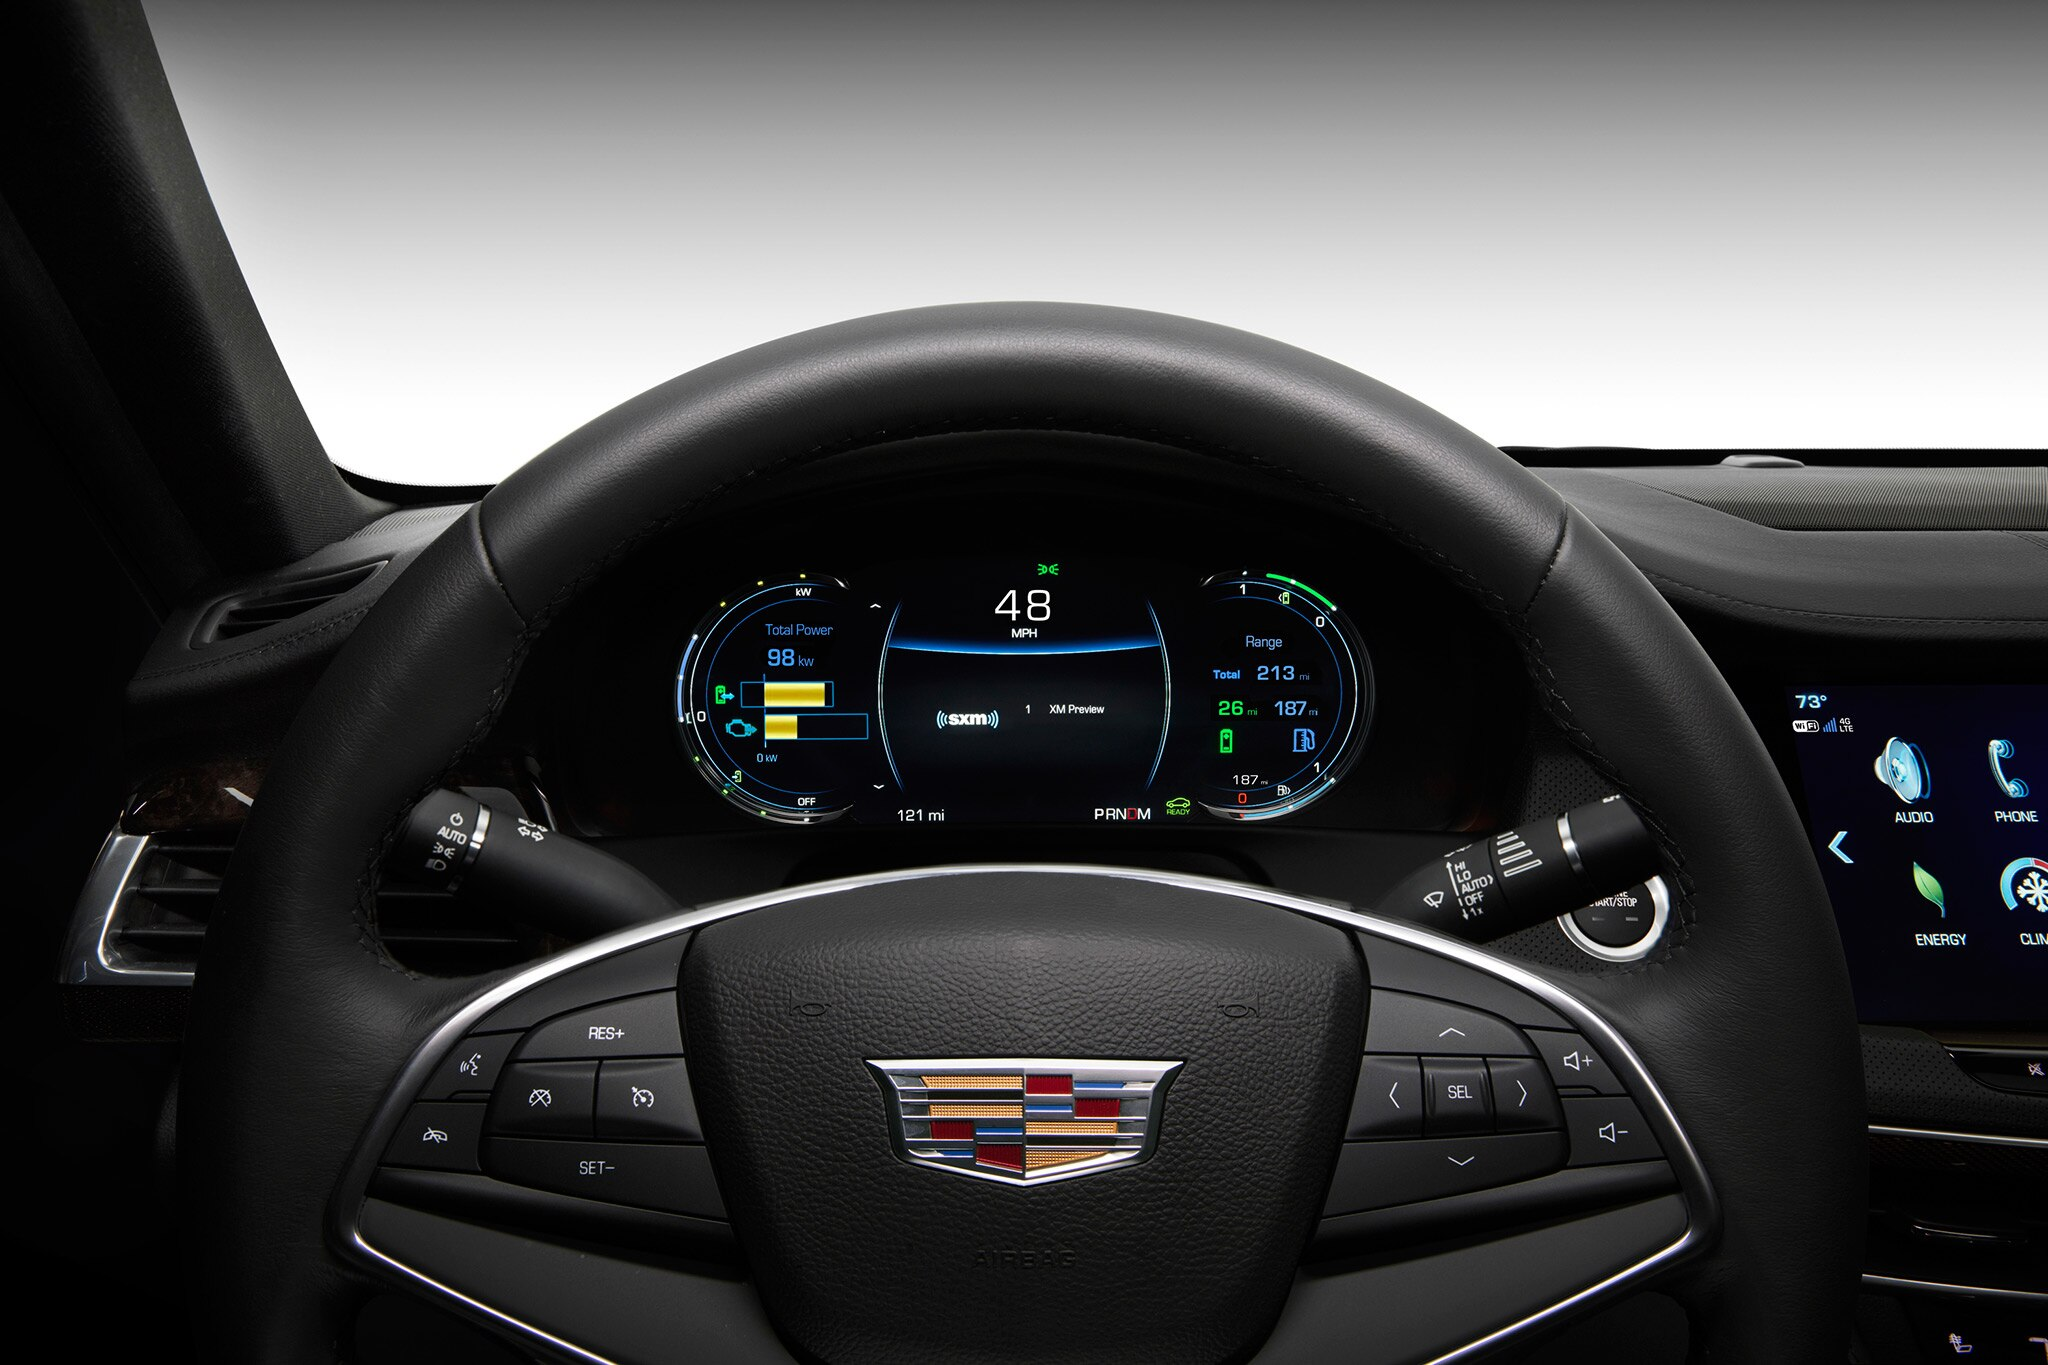 2017 Cadillac CT6 Plug In Hybrid Gauge Cluster